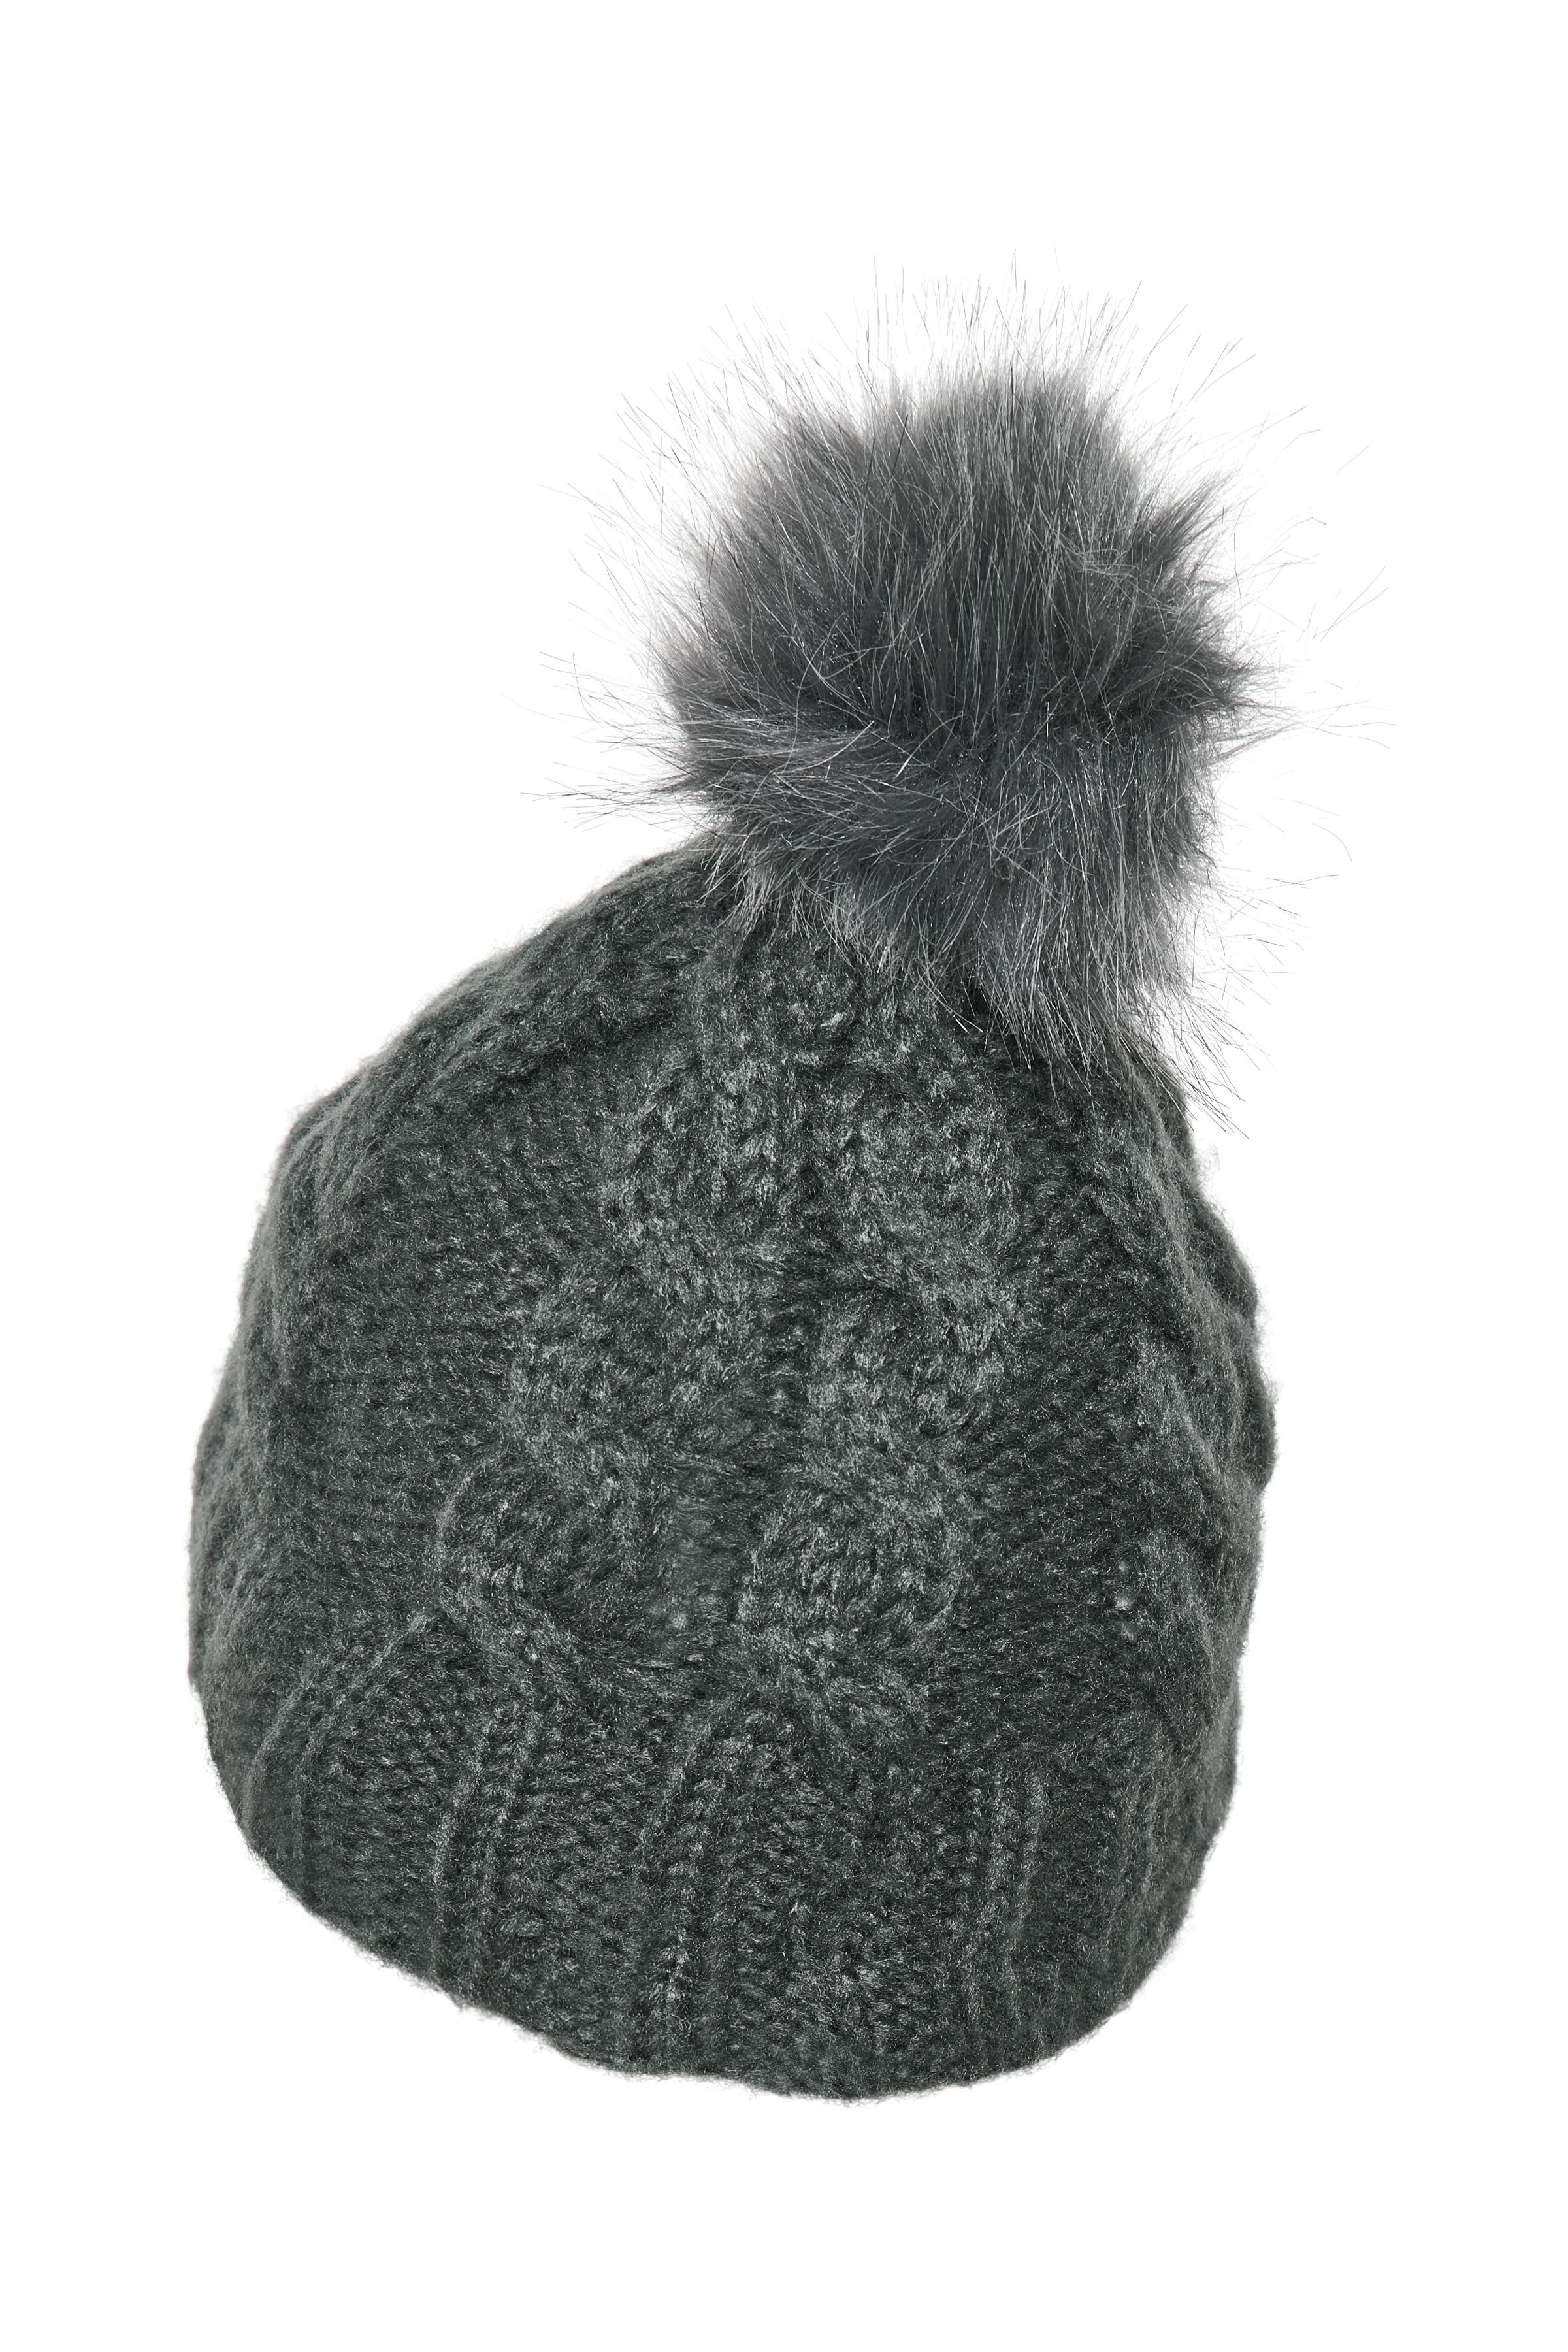 Mørk gråmeleret Hue fra Ichi - accessories – Køb Mørk gråmeleret Hue fra str. ONE her